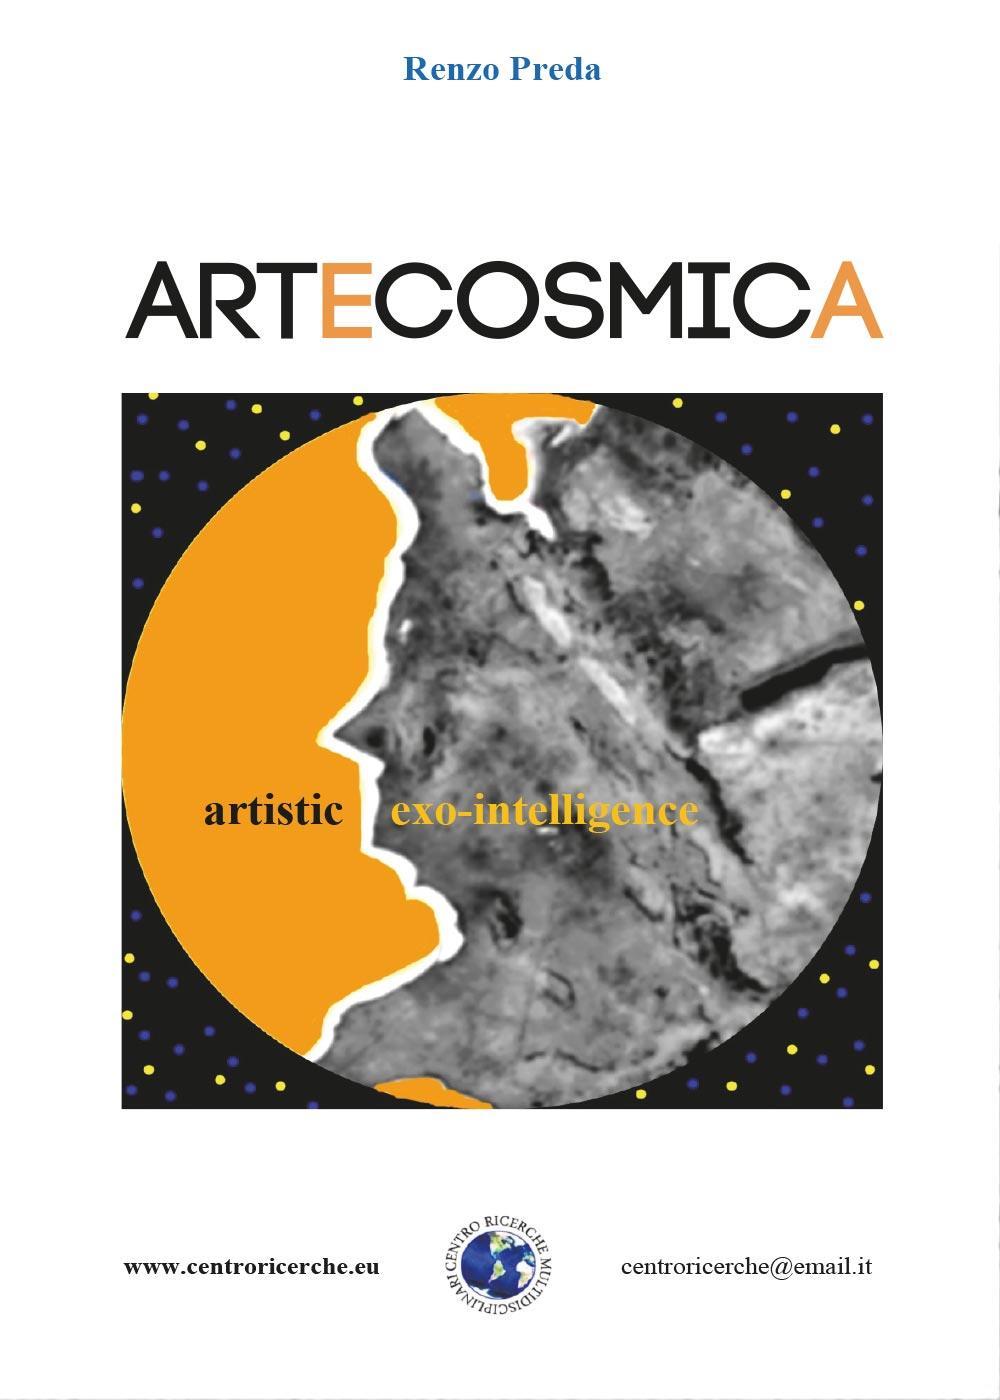 Artecosmica. Artistic exo-intelligence